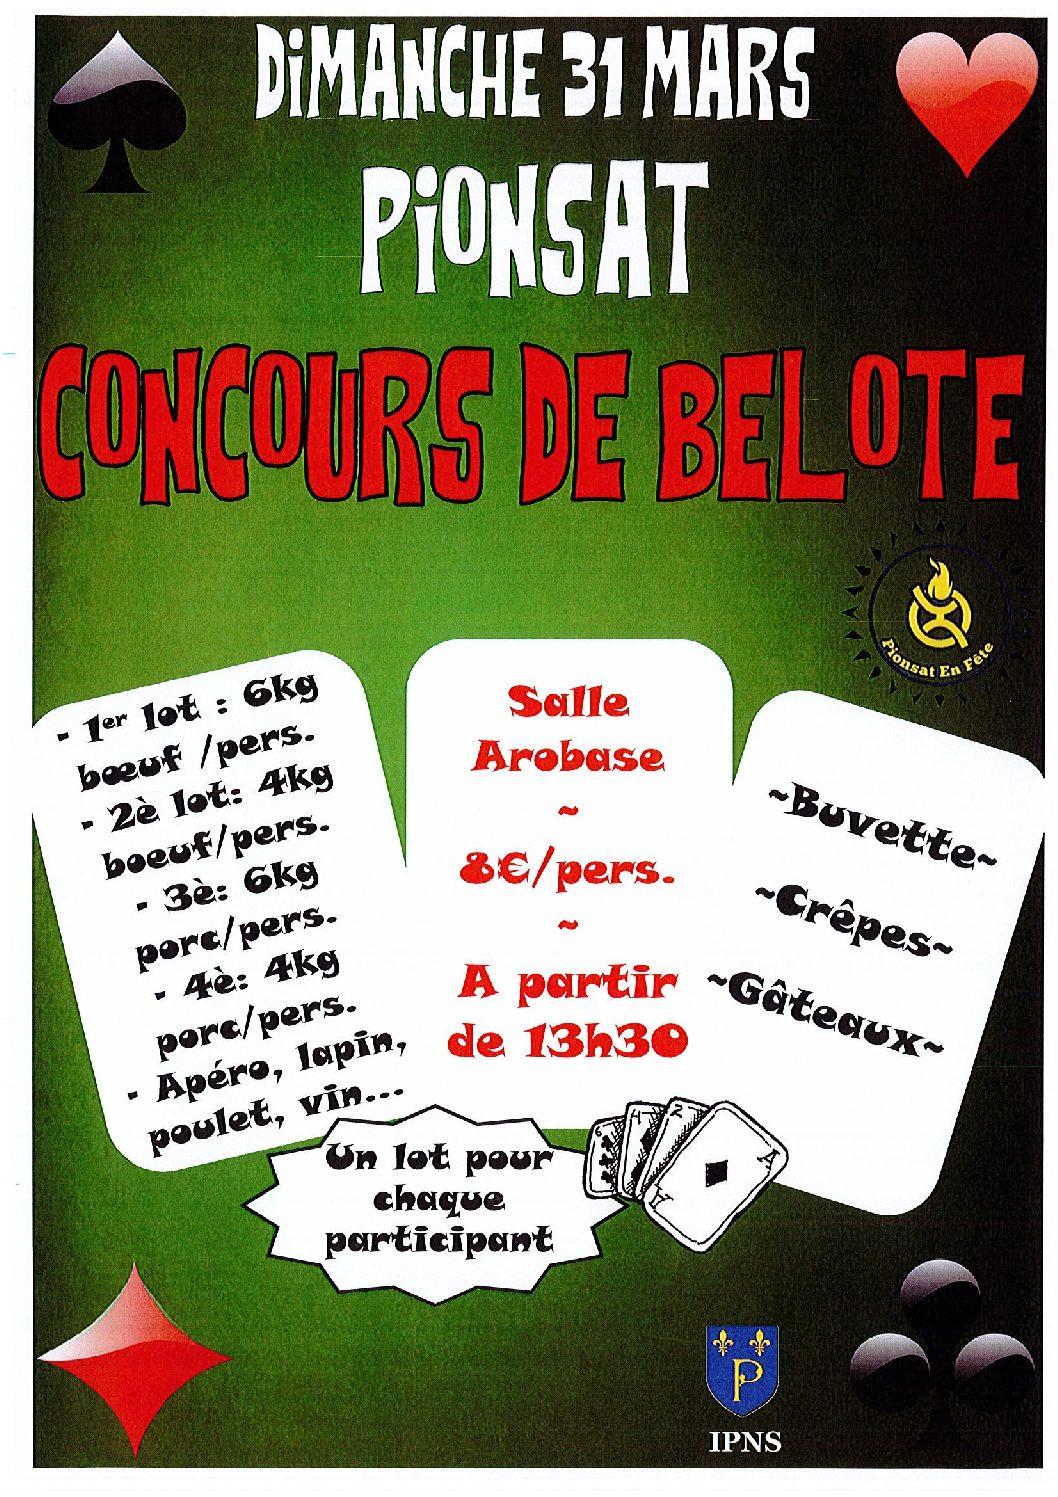 CONCOURS DE BELOTE DU 31 MARS